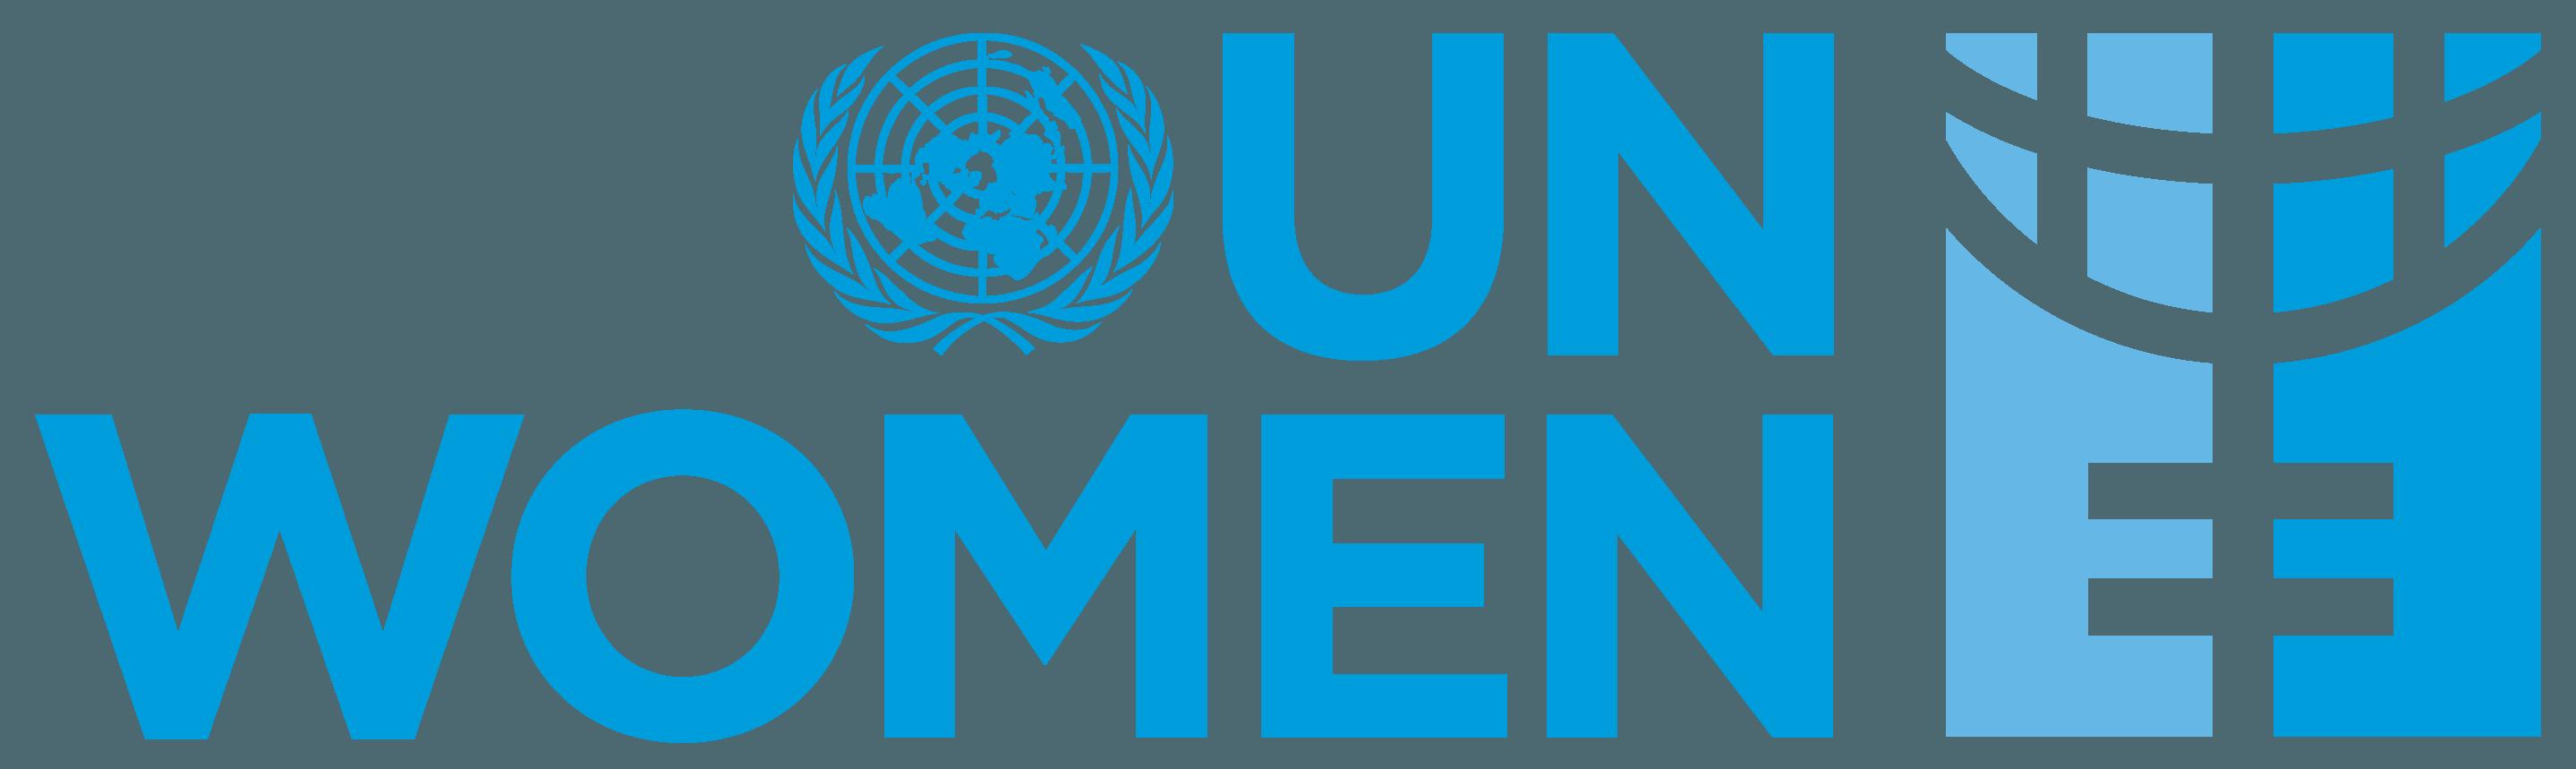 kisspng-united-nations-headquarters-un-women-women-s-right-international-women-day-5b4fb909900ae5.42130320153195136959